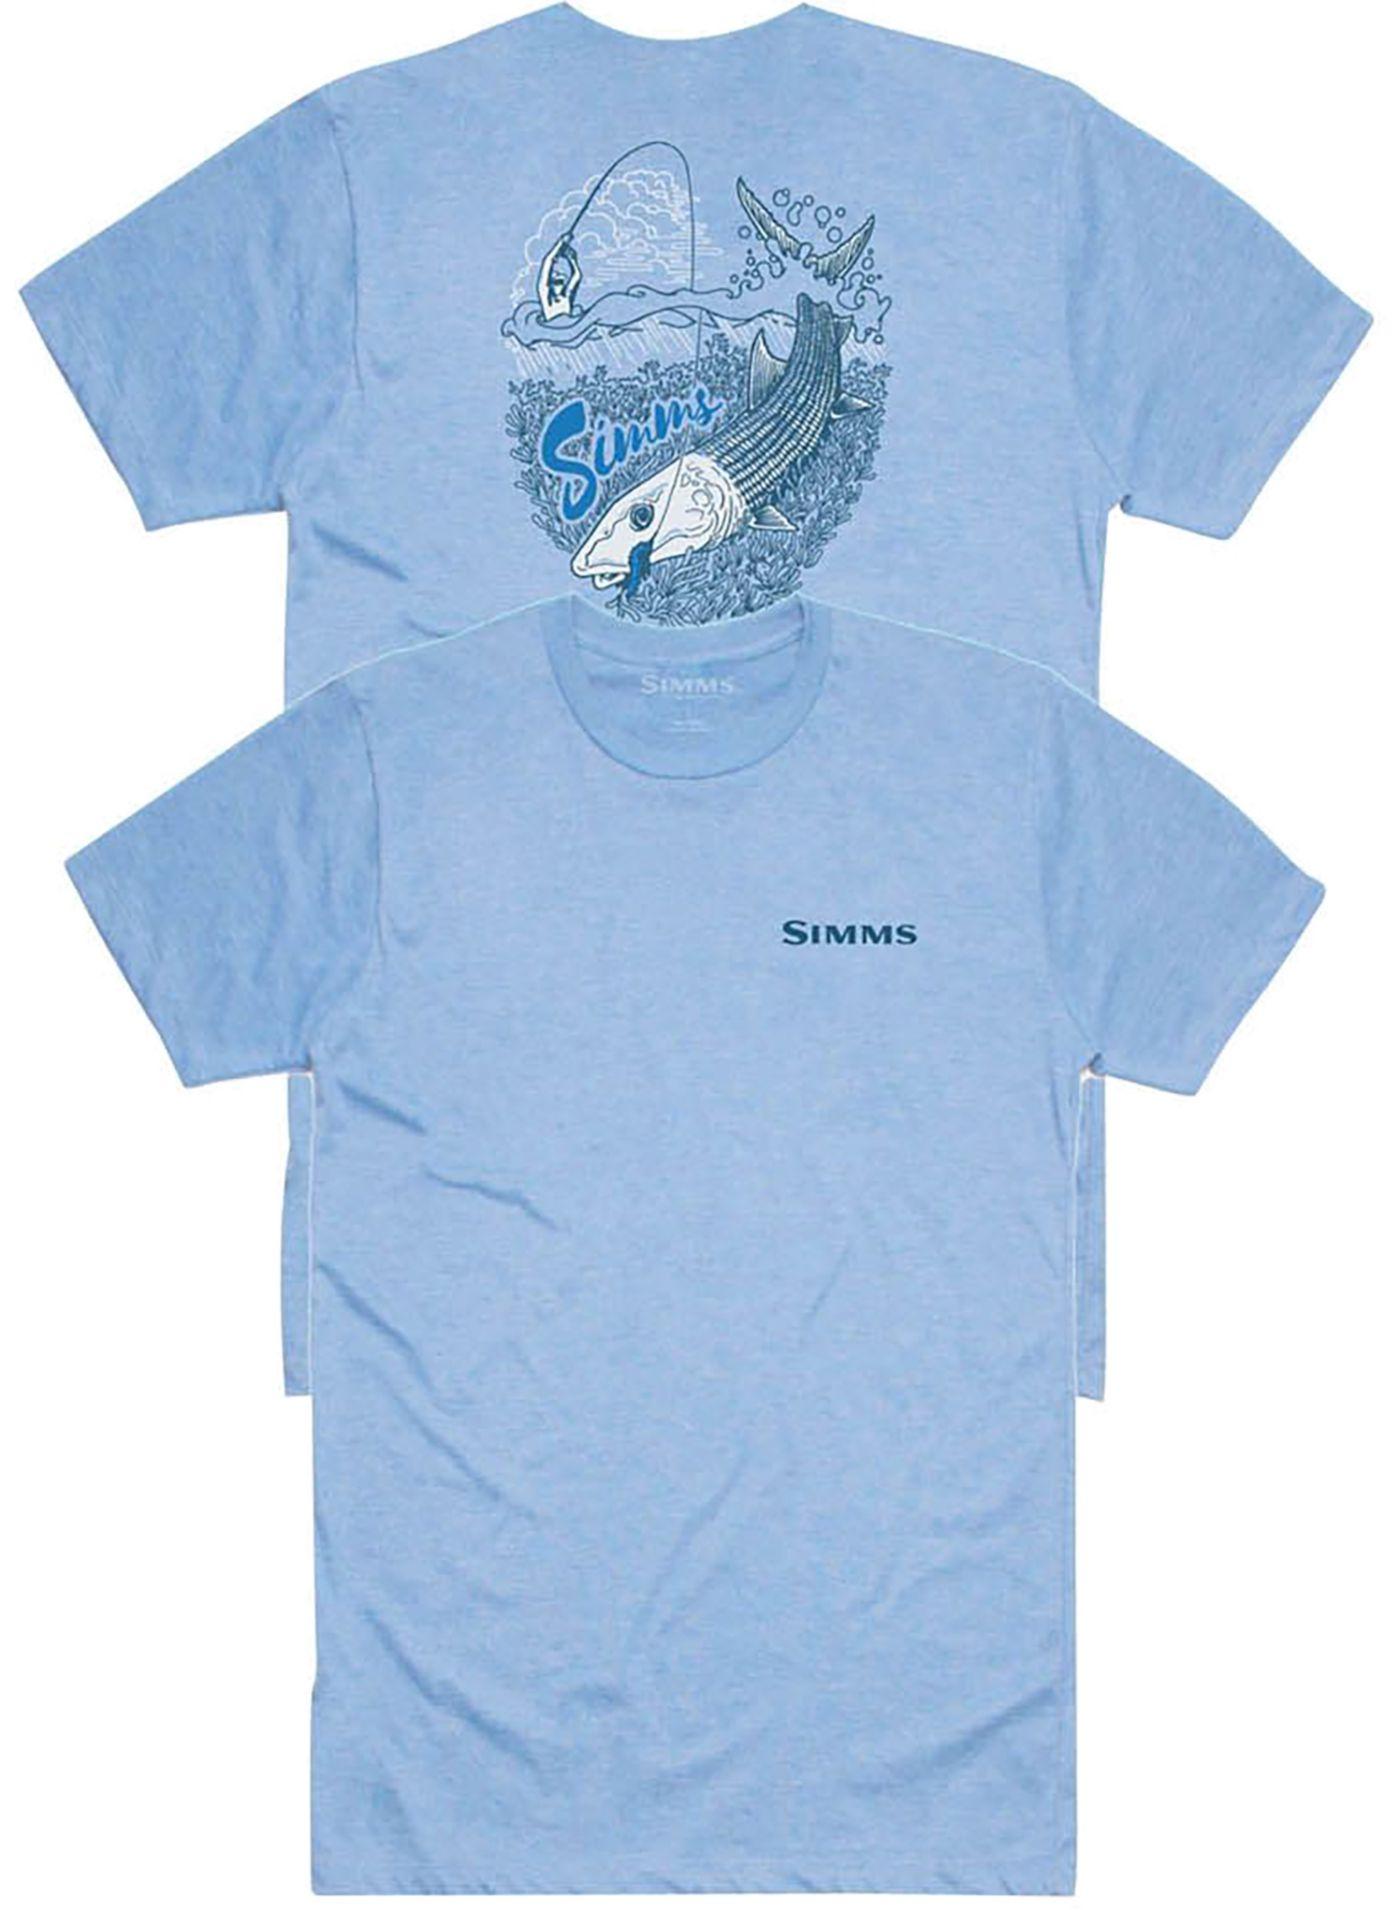 Simms Men's Graphic T-Shirt